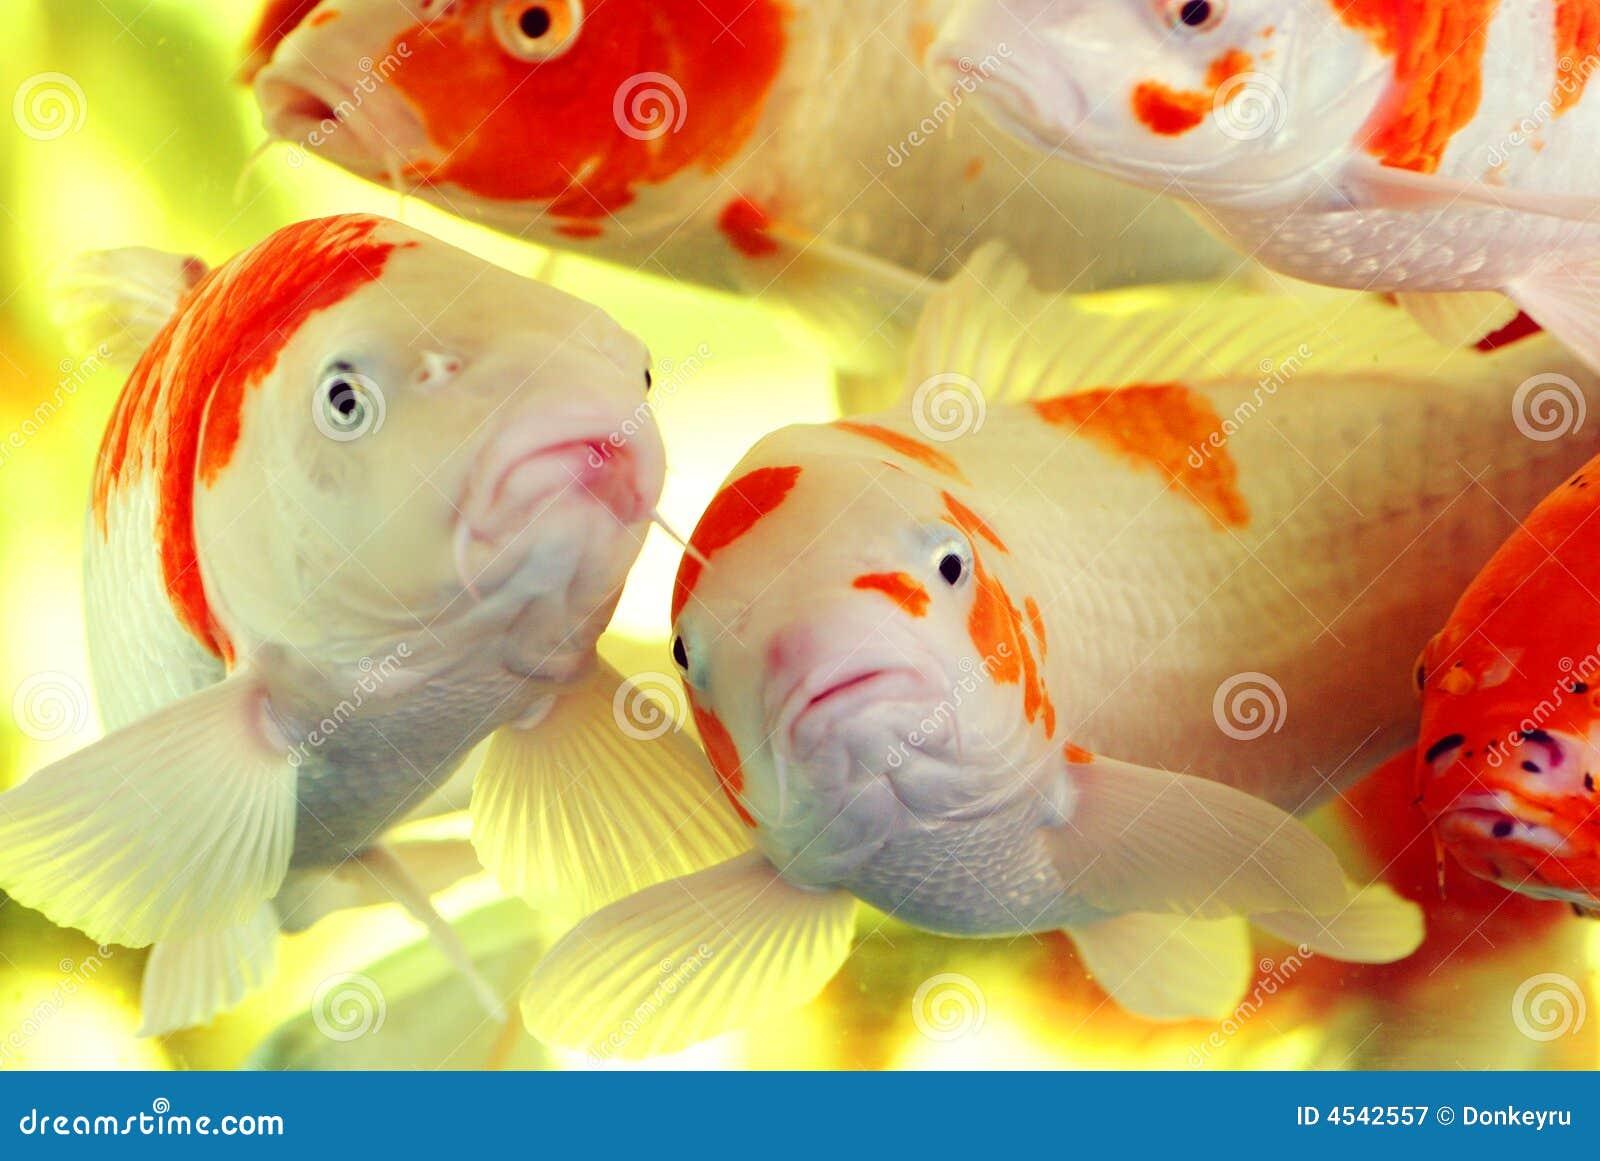 Bunte koi karpfen lizenzfreie stockfotografie bild 4542557 for Bunte goldfische